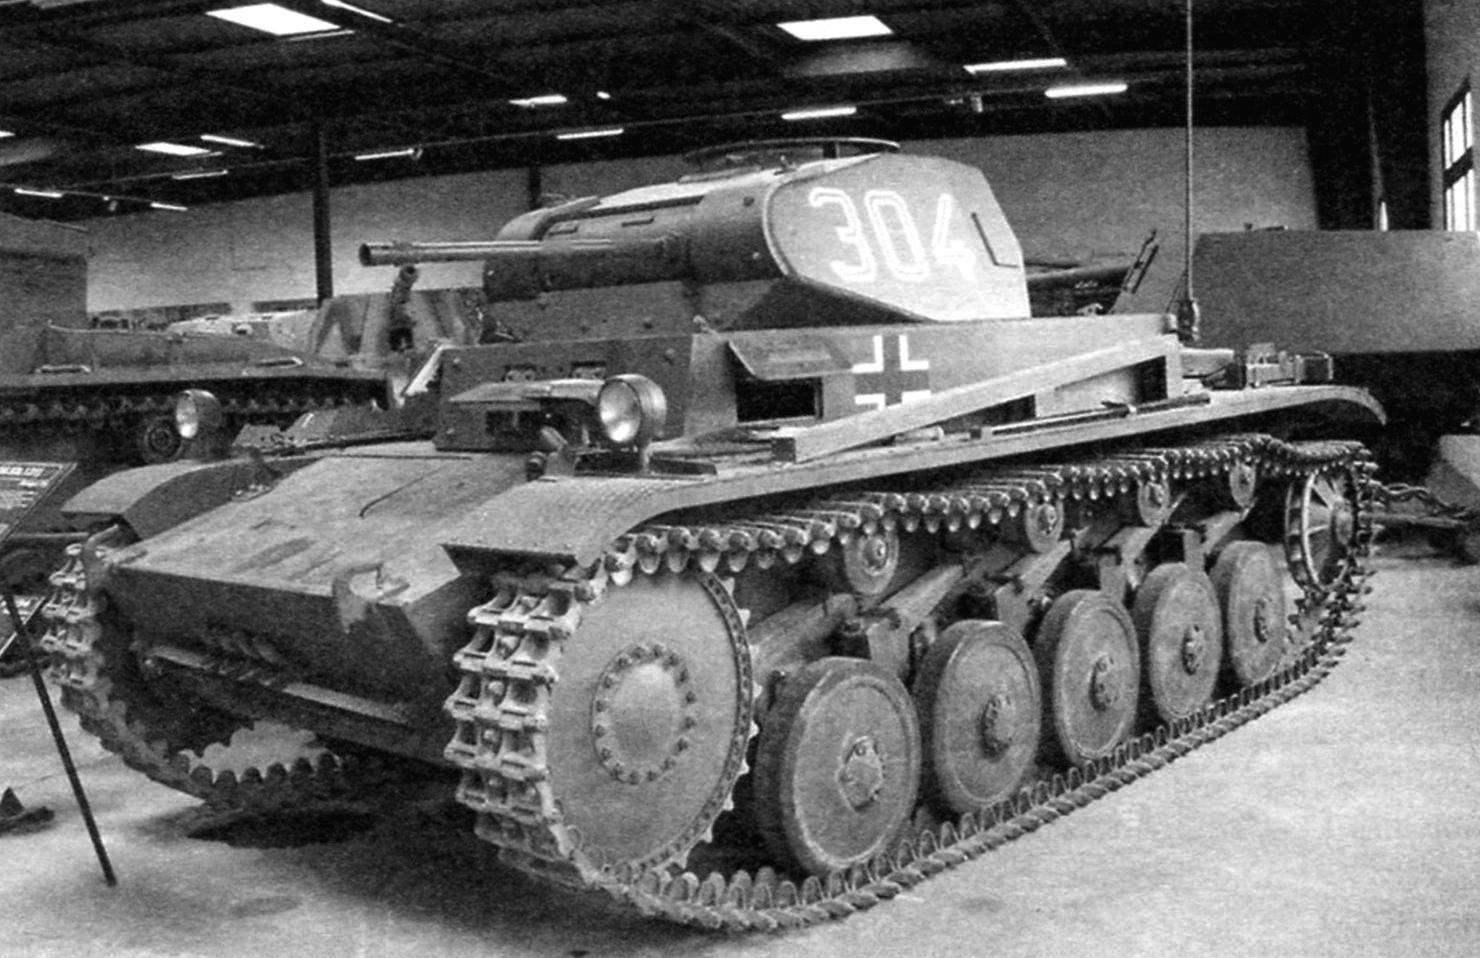 Немецкий танк Pz. Kpfw. II (T-Il), на шасси которого создана САУ «Веспе»